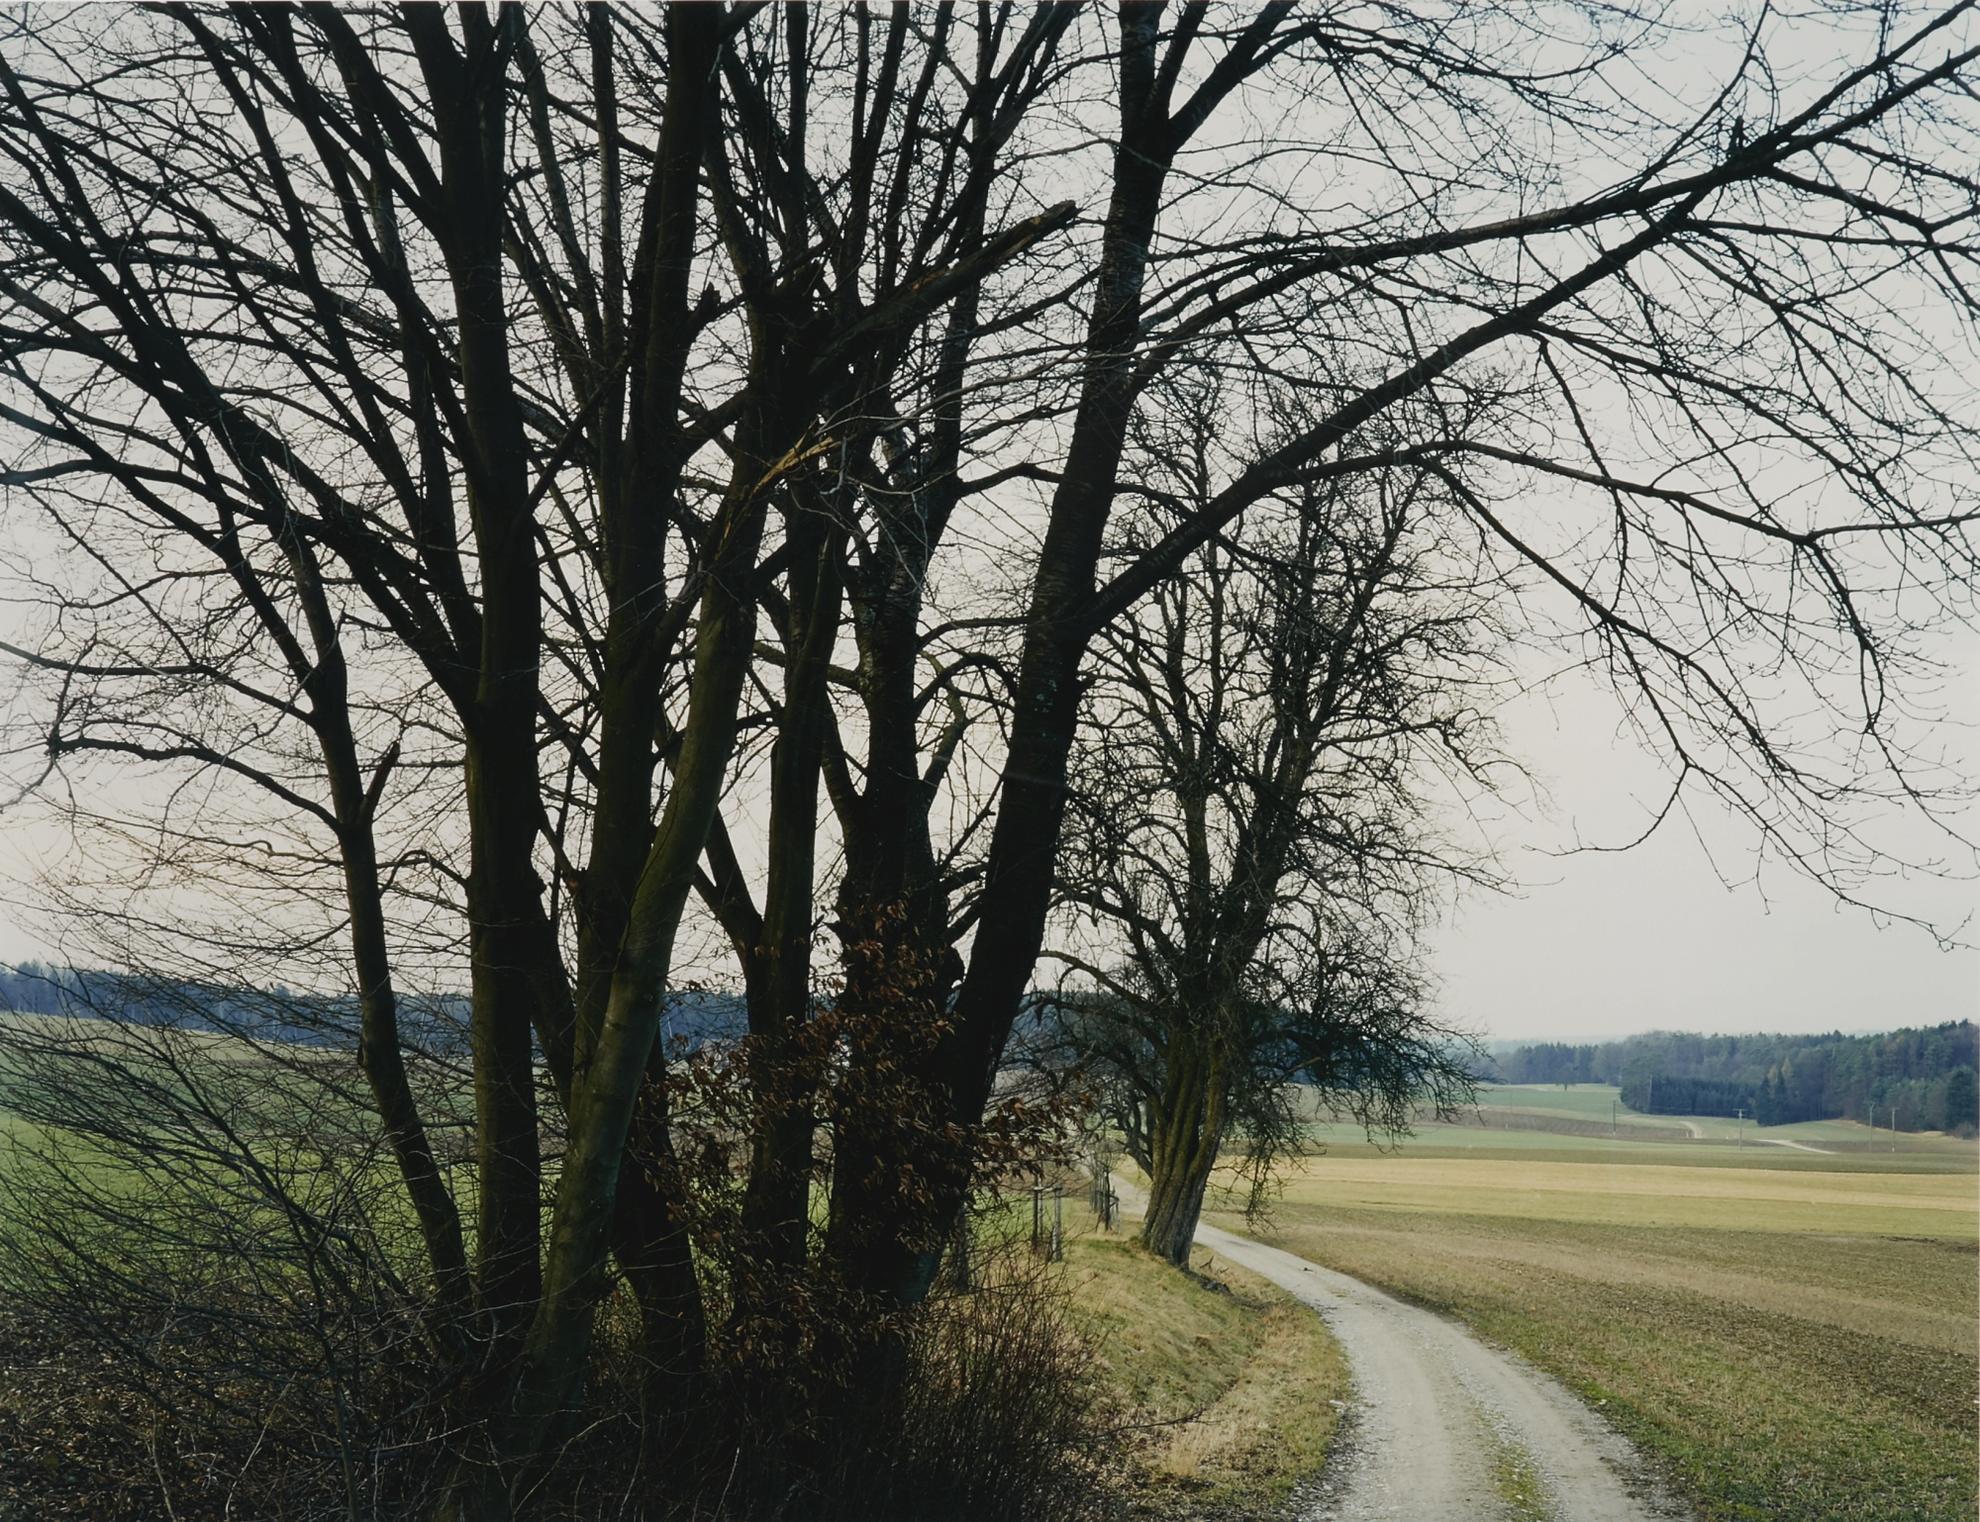 Thomas Struth-Baumgruppe Bei Rutschwil No. 25, Winterthur-1993